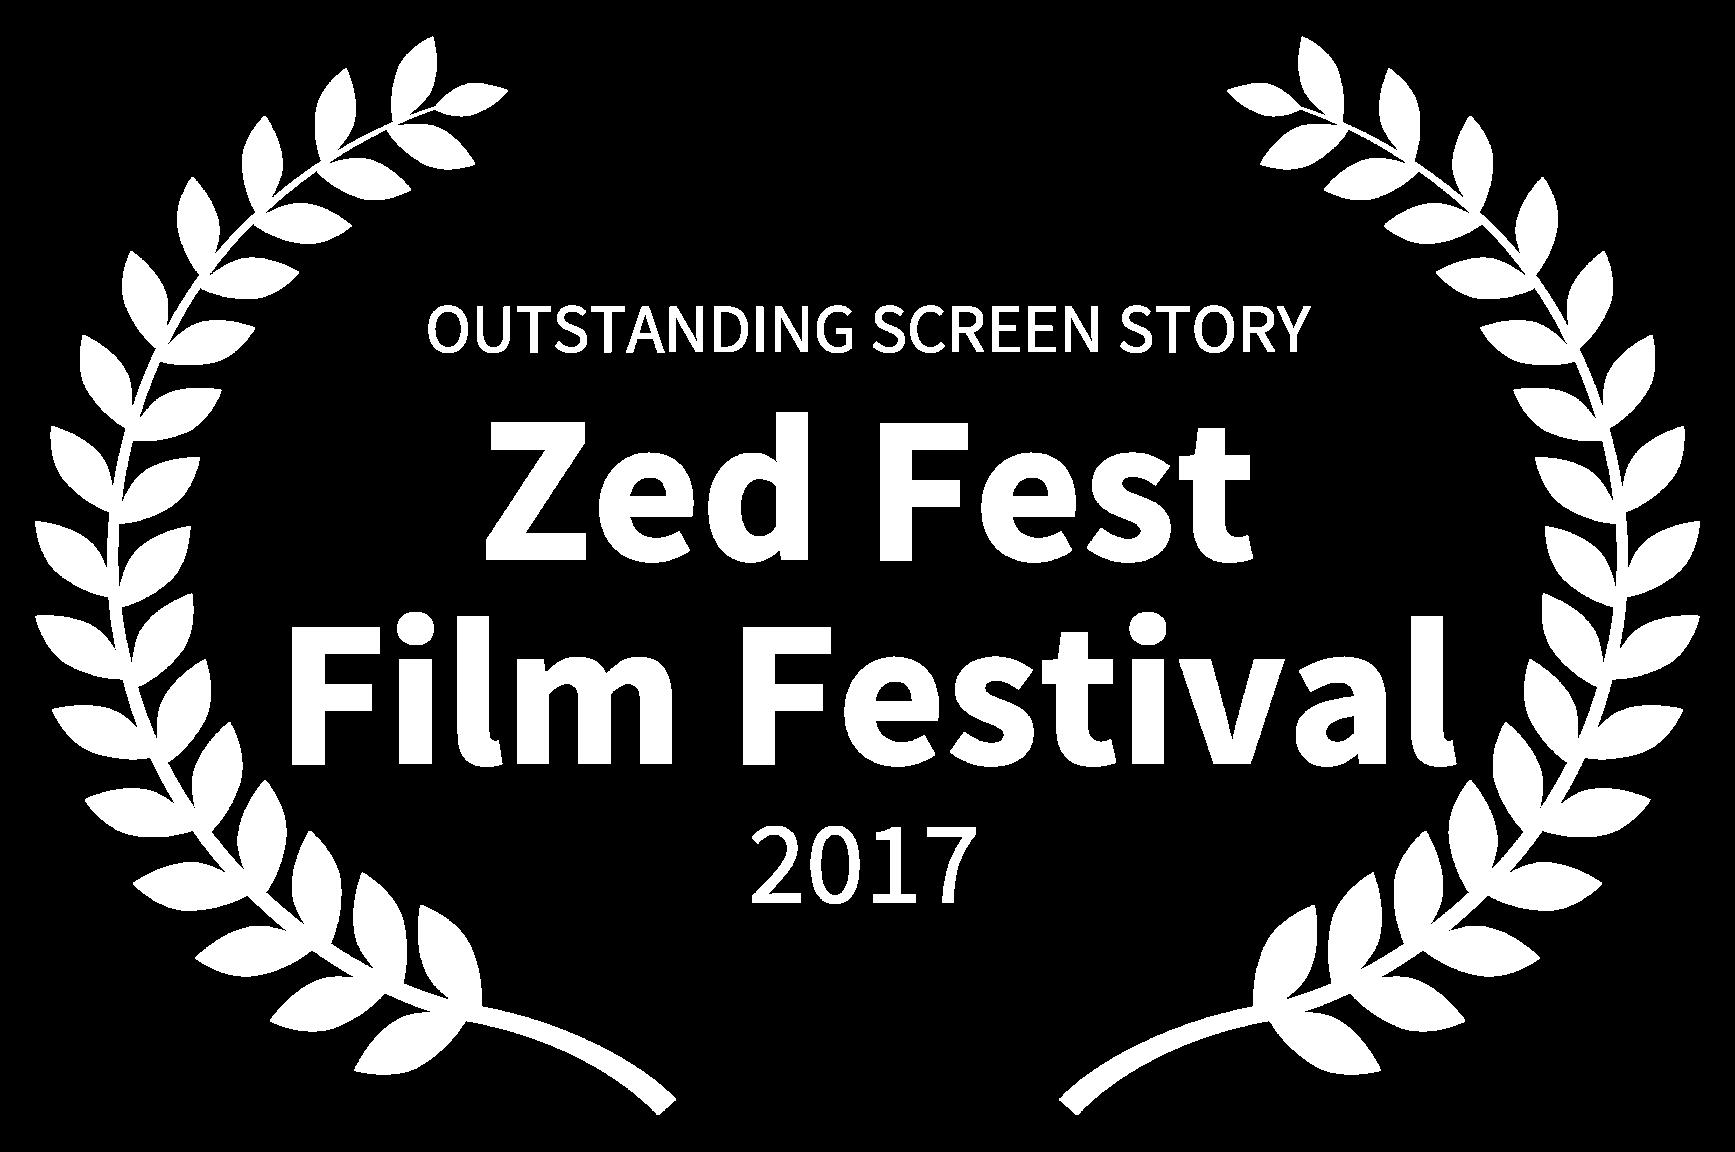 OUTSTANDING SCREEN STORY - Zed Fest Film Festival - 2017(1).png